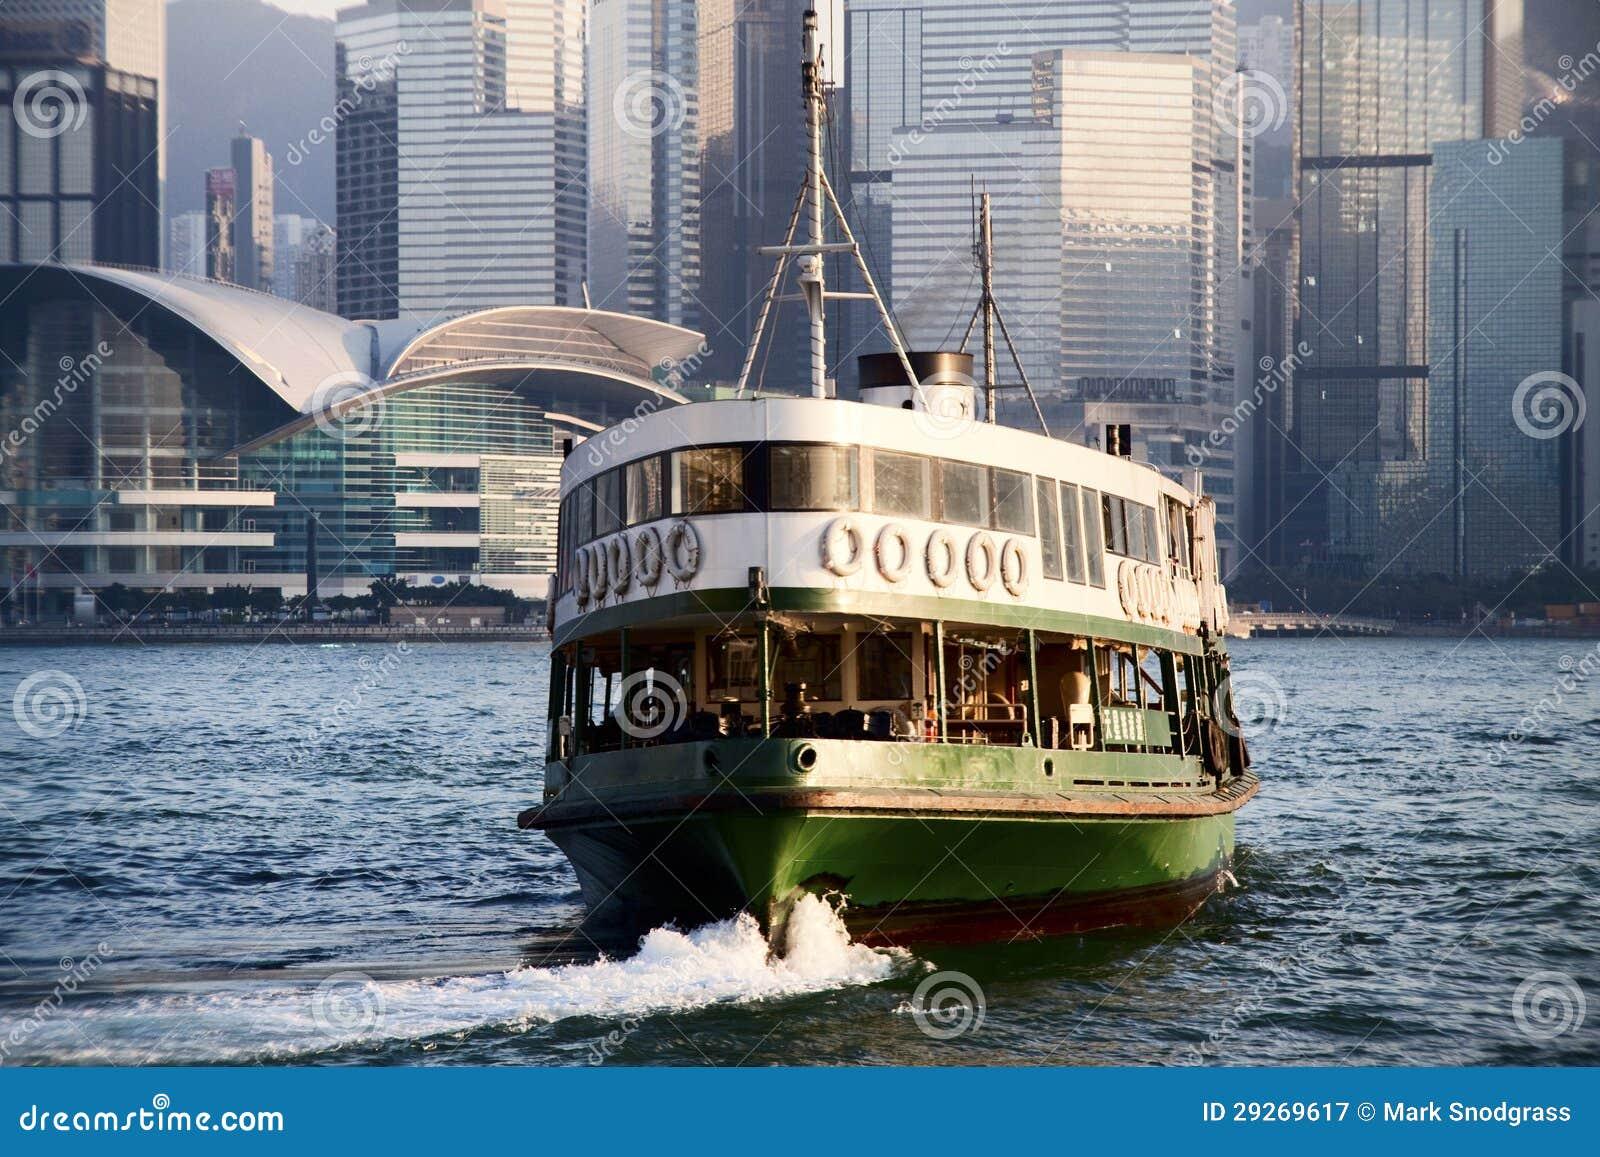 Hong Kong Star Ferry at dusk